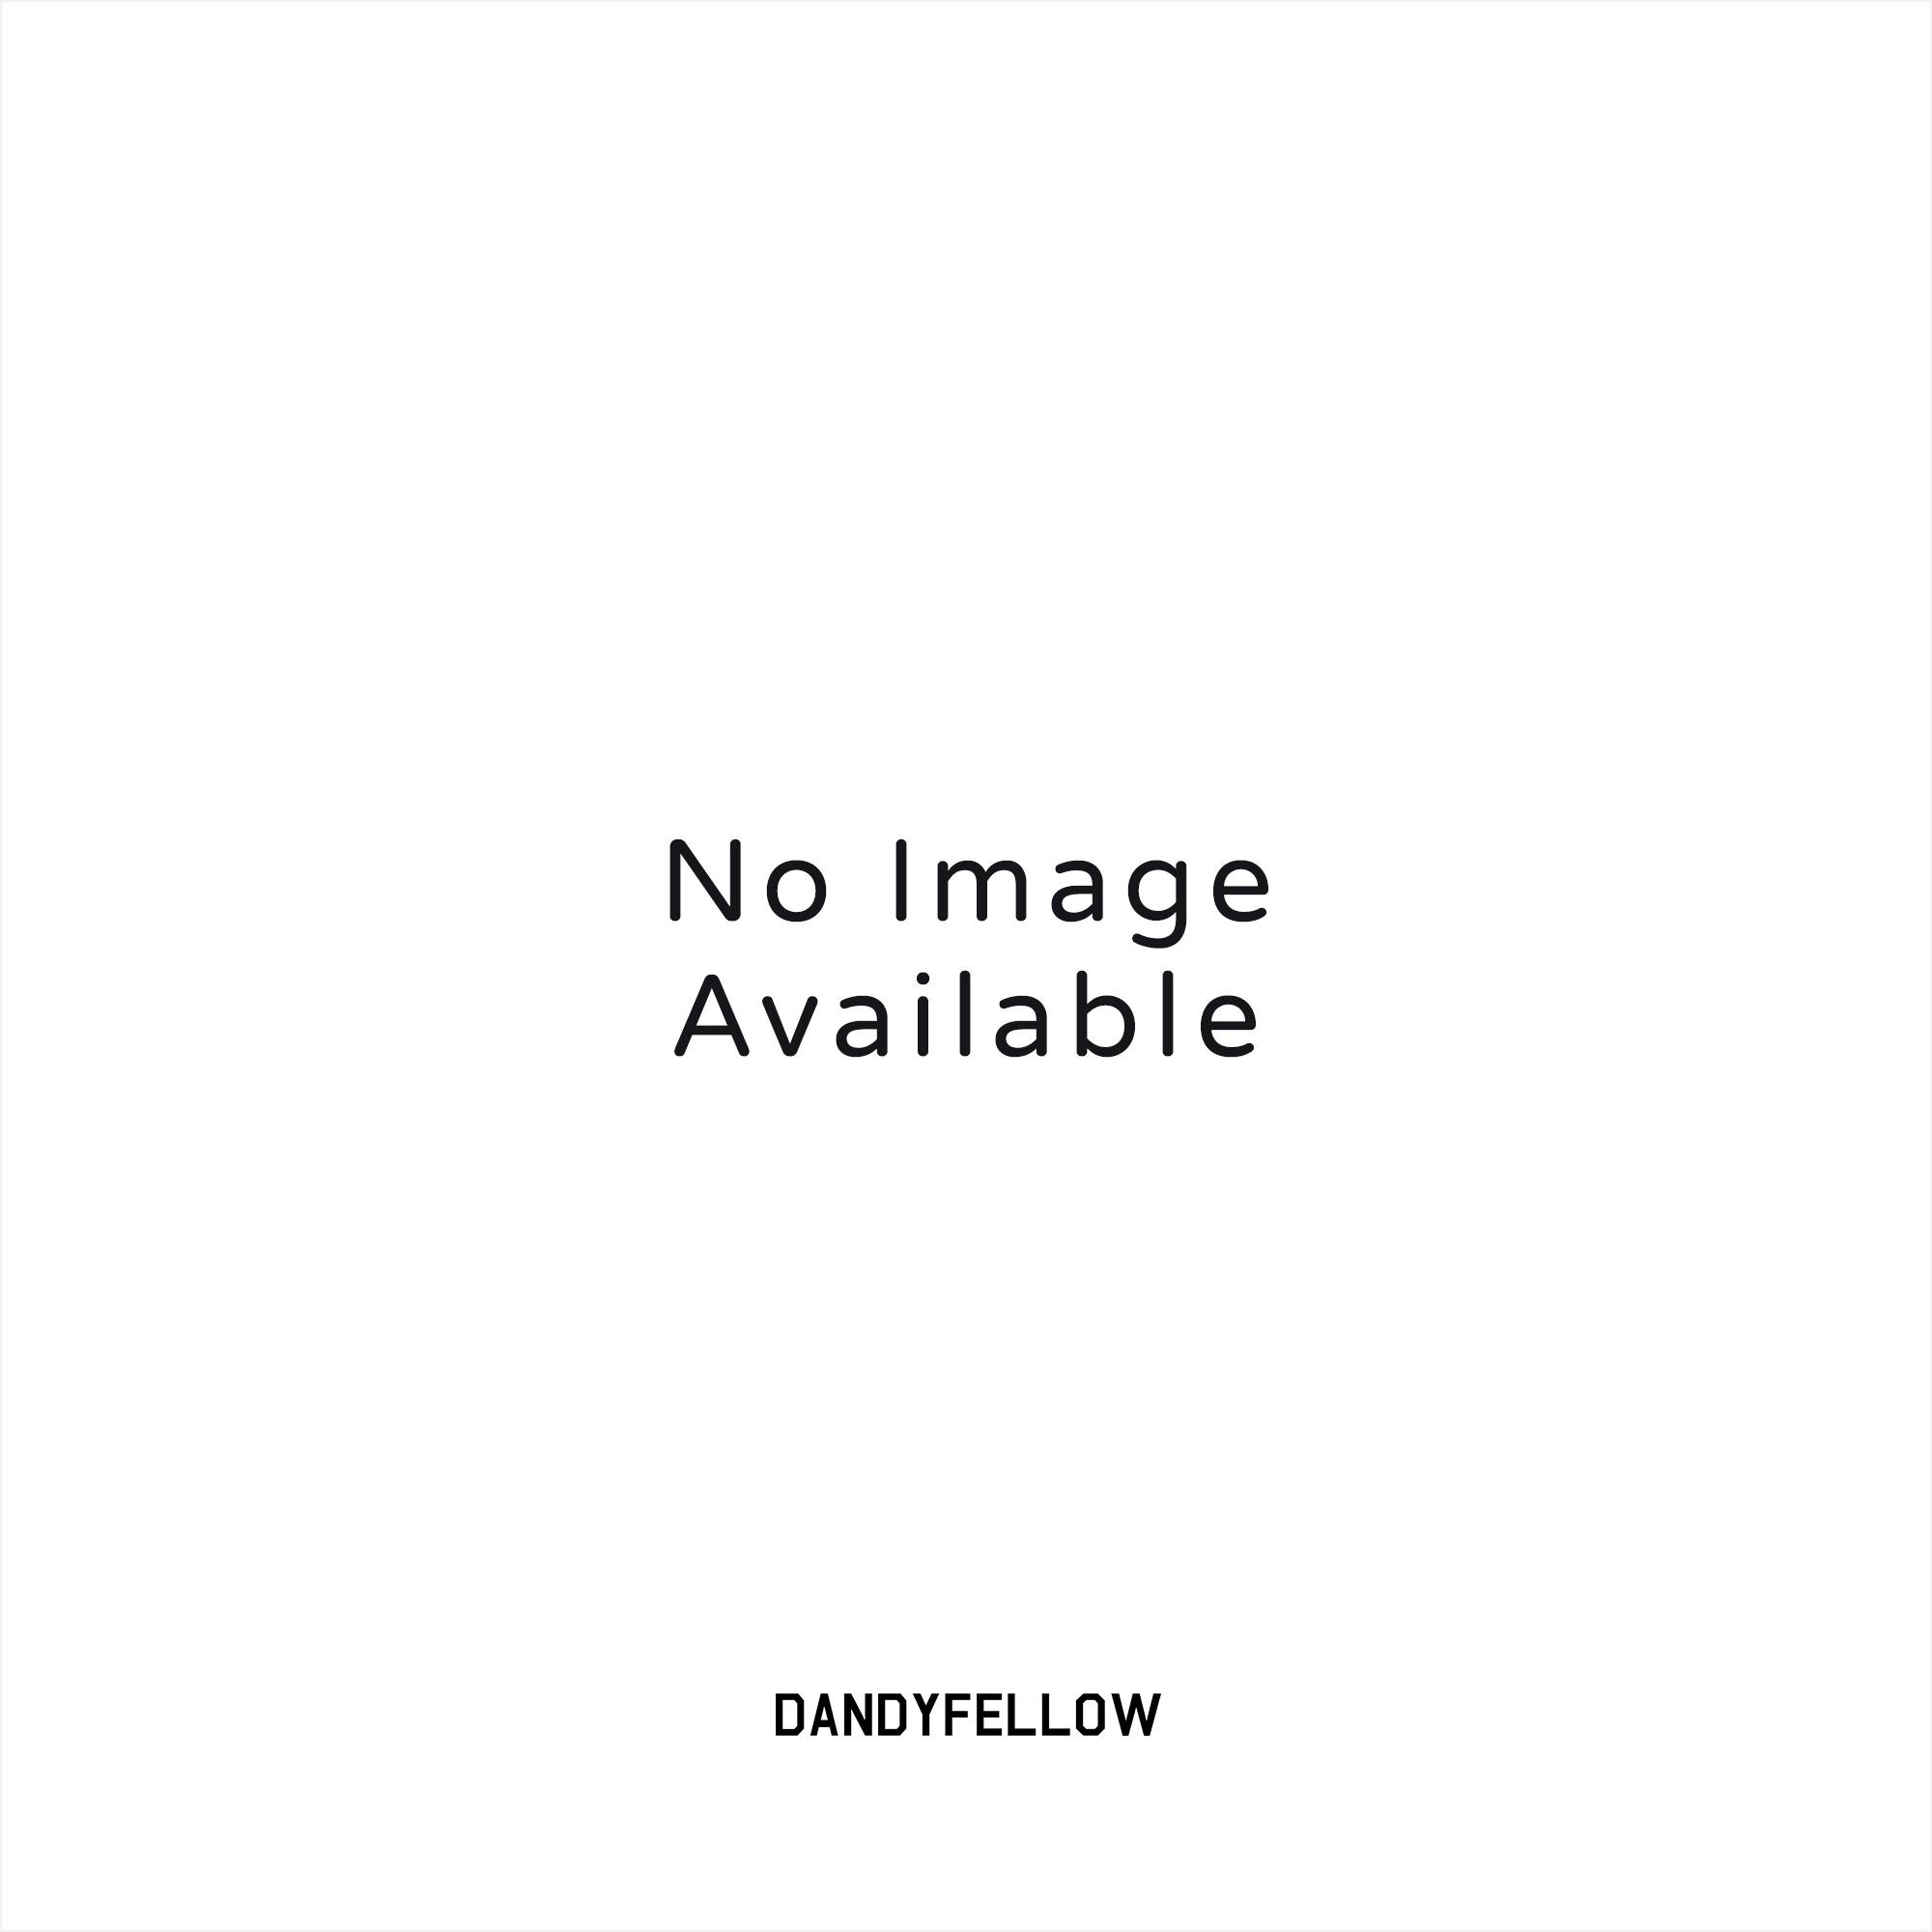 Ray Ban Ray-Ban Outdoorsman Gold Sunglasses RB3030 L0216